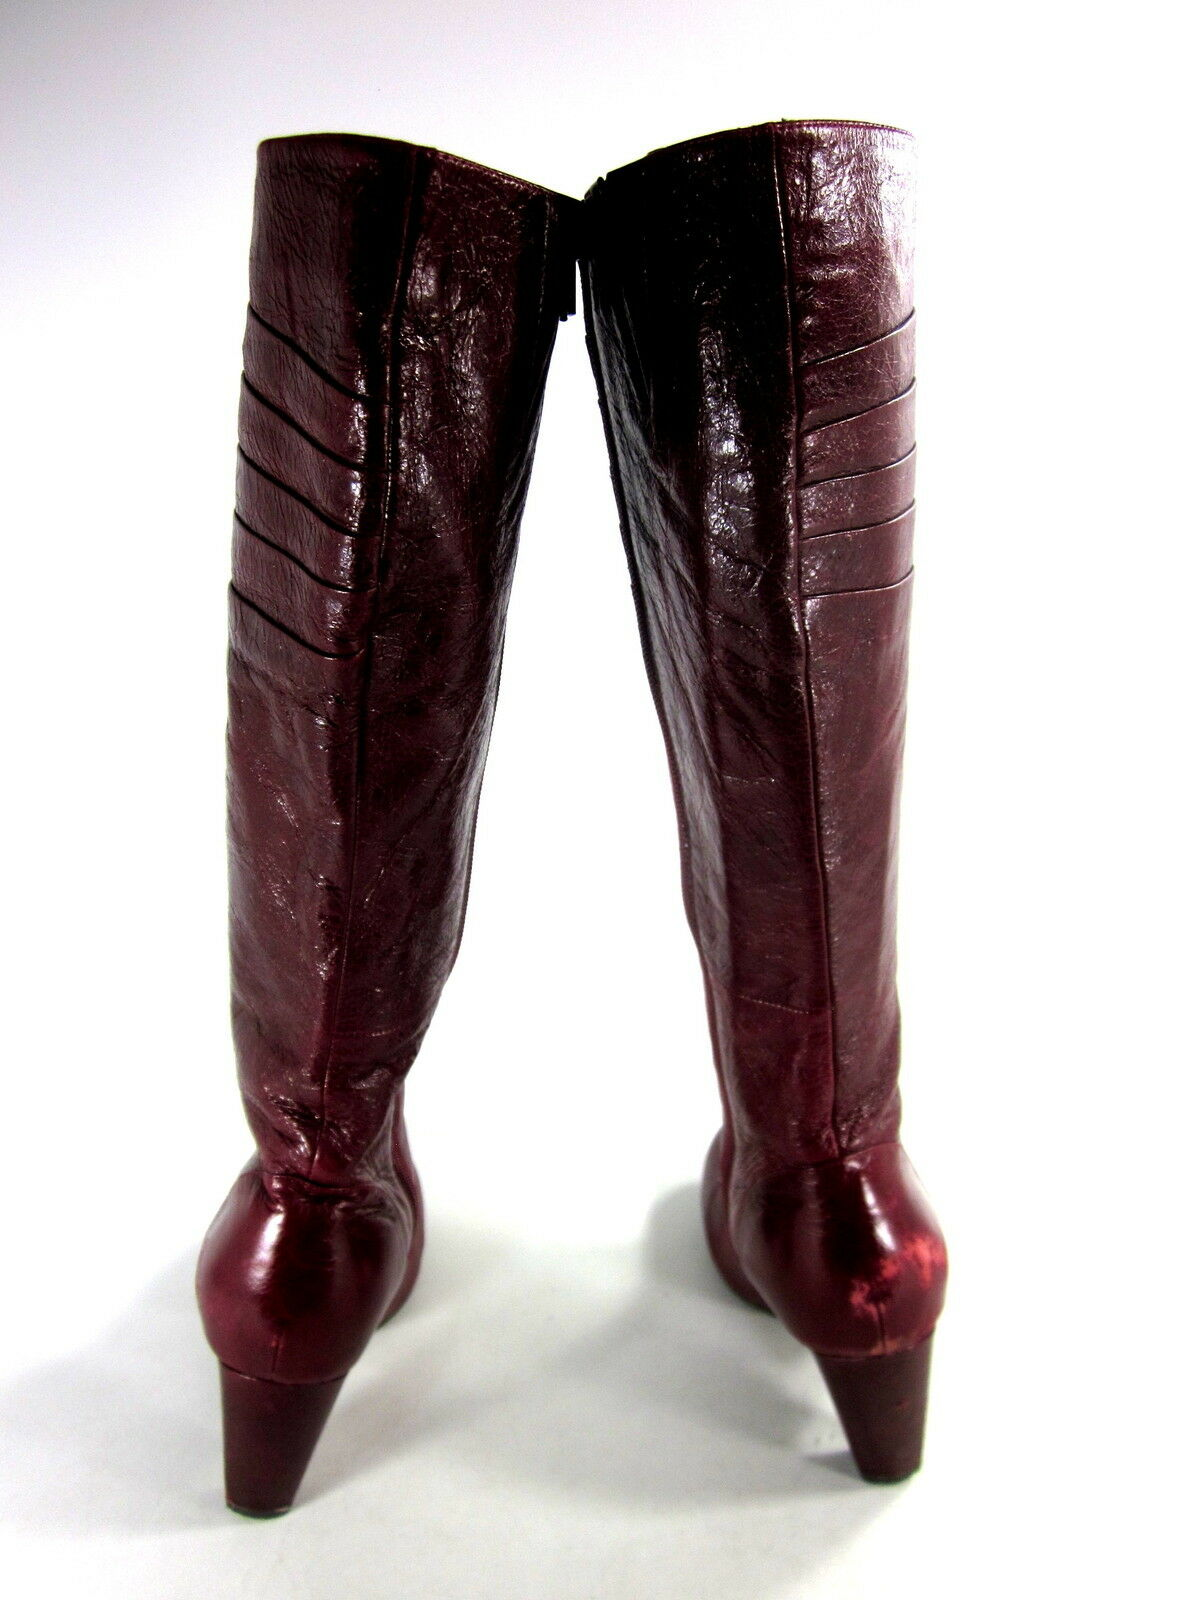 MIZ MOOZ WOMEN'S NARA LEATHER UNDER-THE-KNEE FASHION Stiefel ROT LEATHER NARA US SIZE 7.5 MED 778186